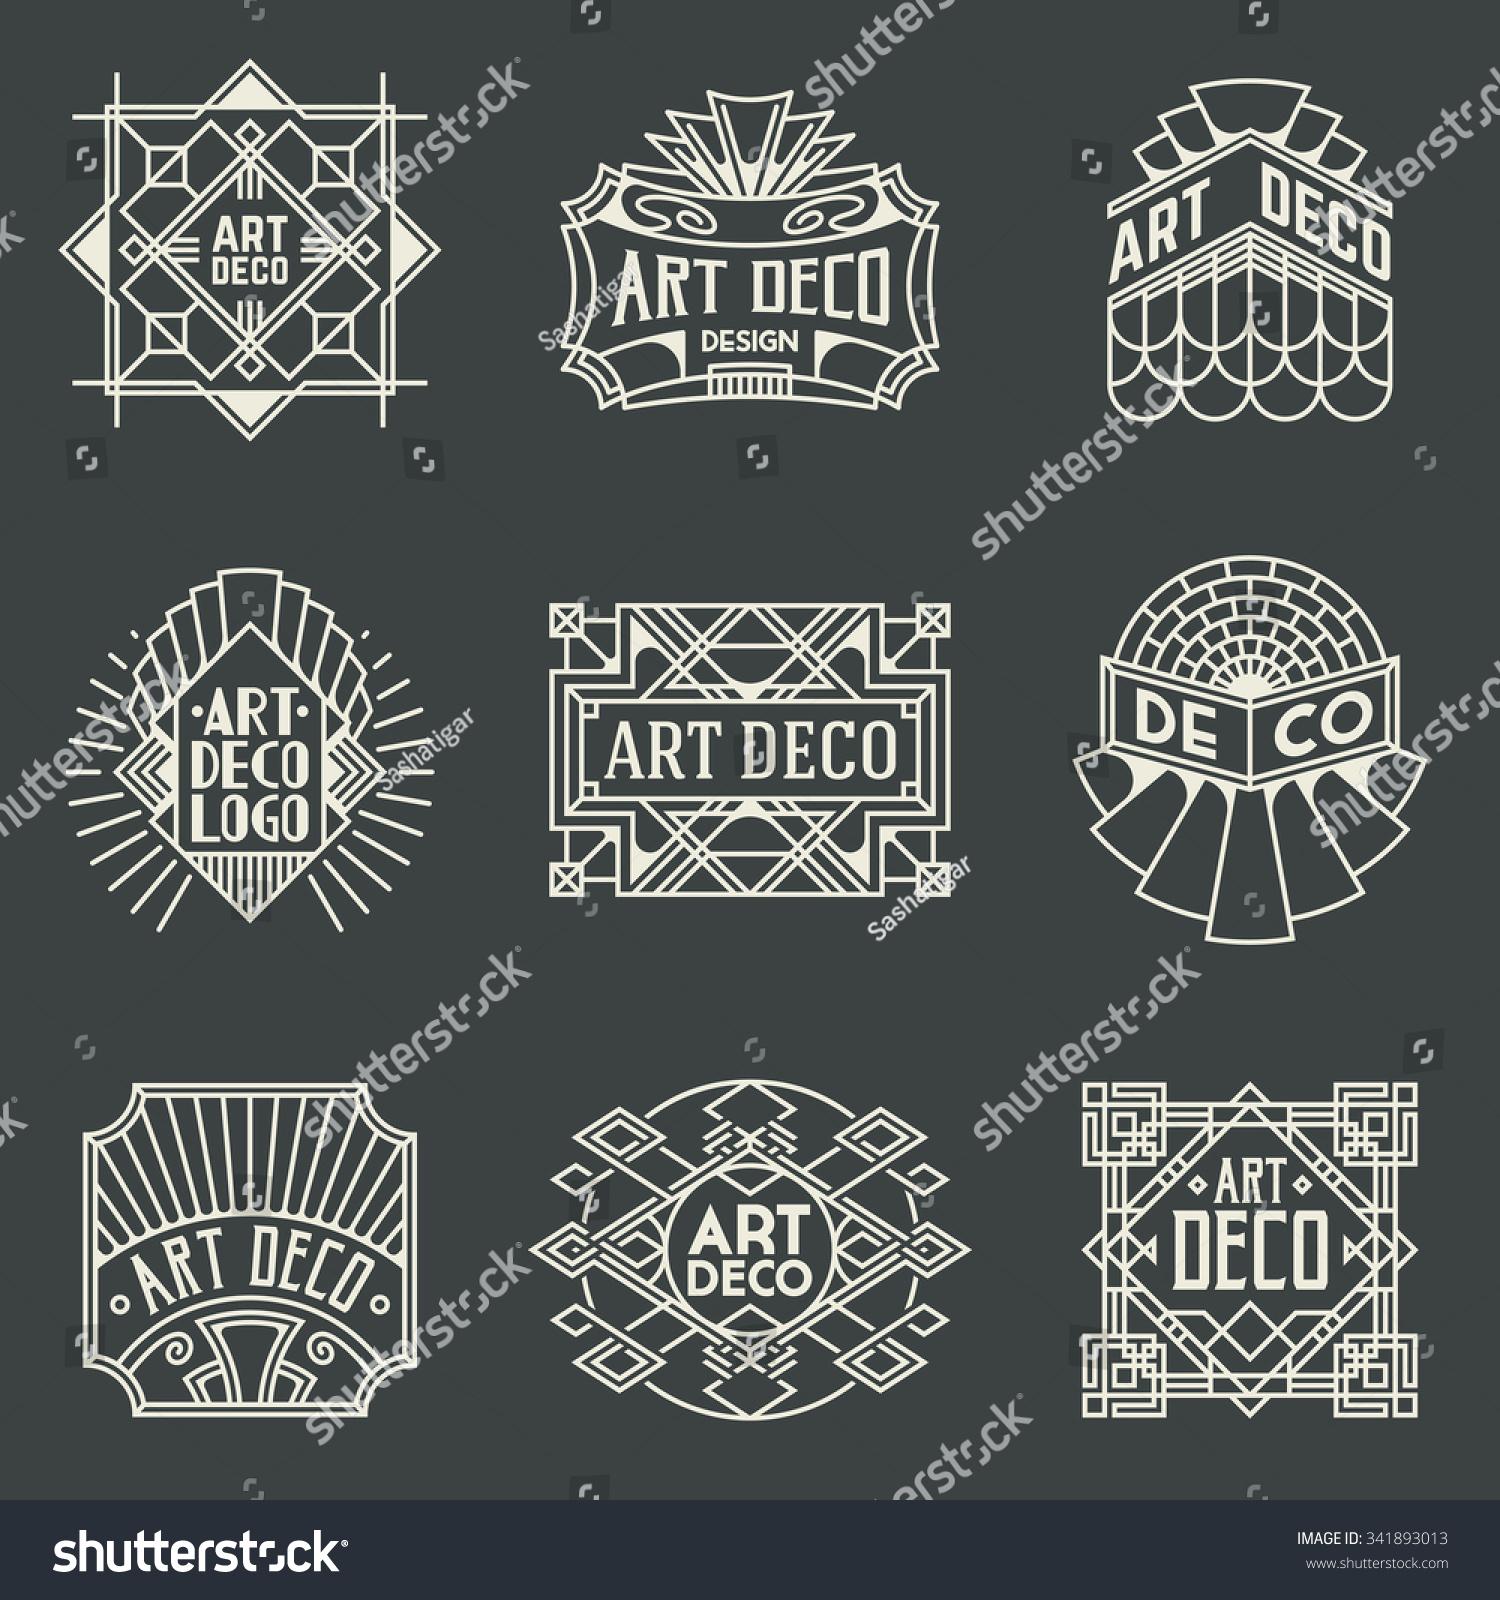 Art Deco Line Design : Art deco insignias retro design logotypes stock vector